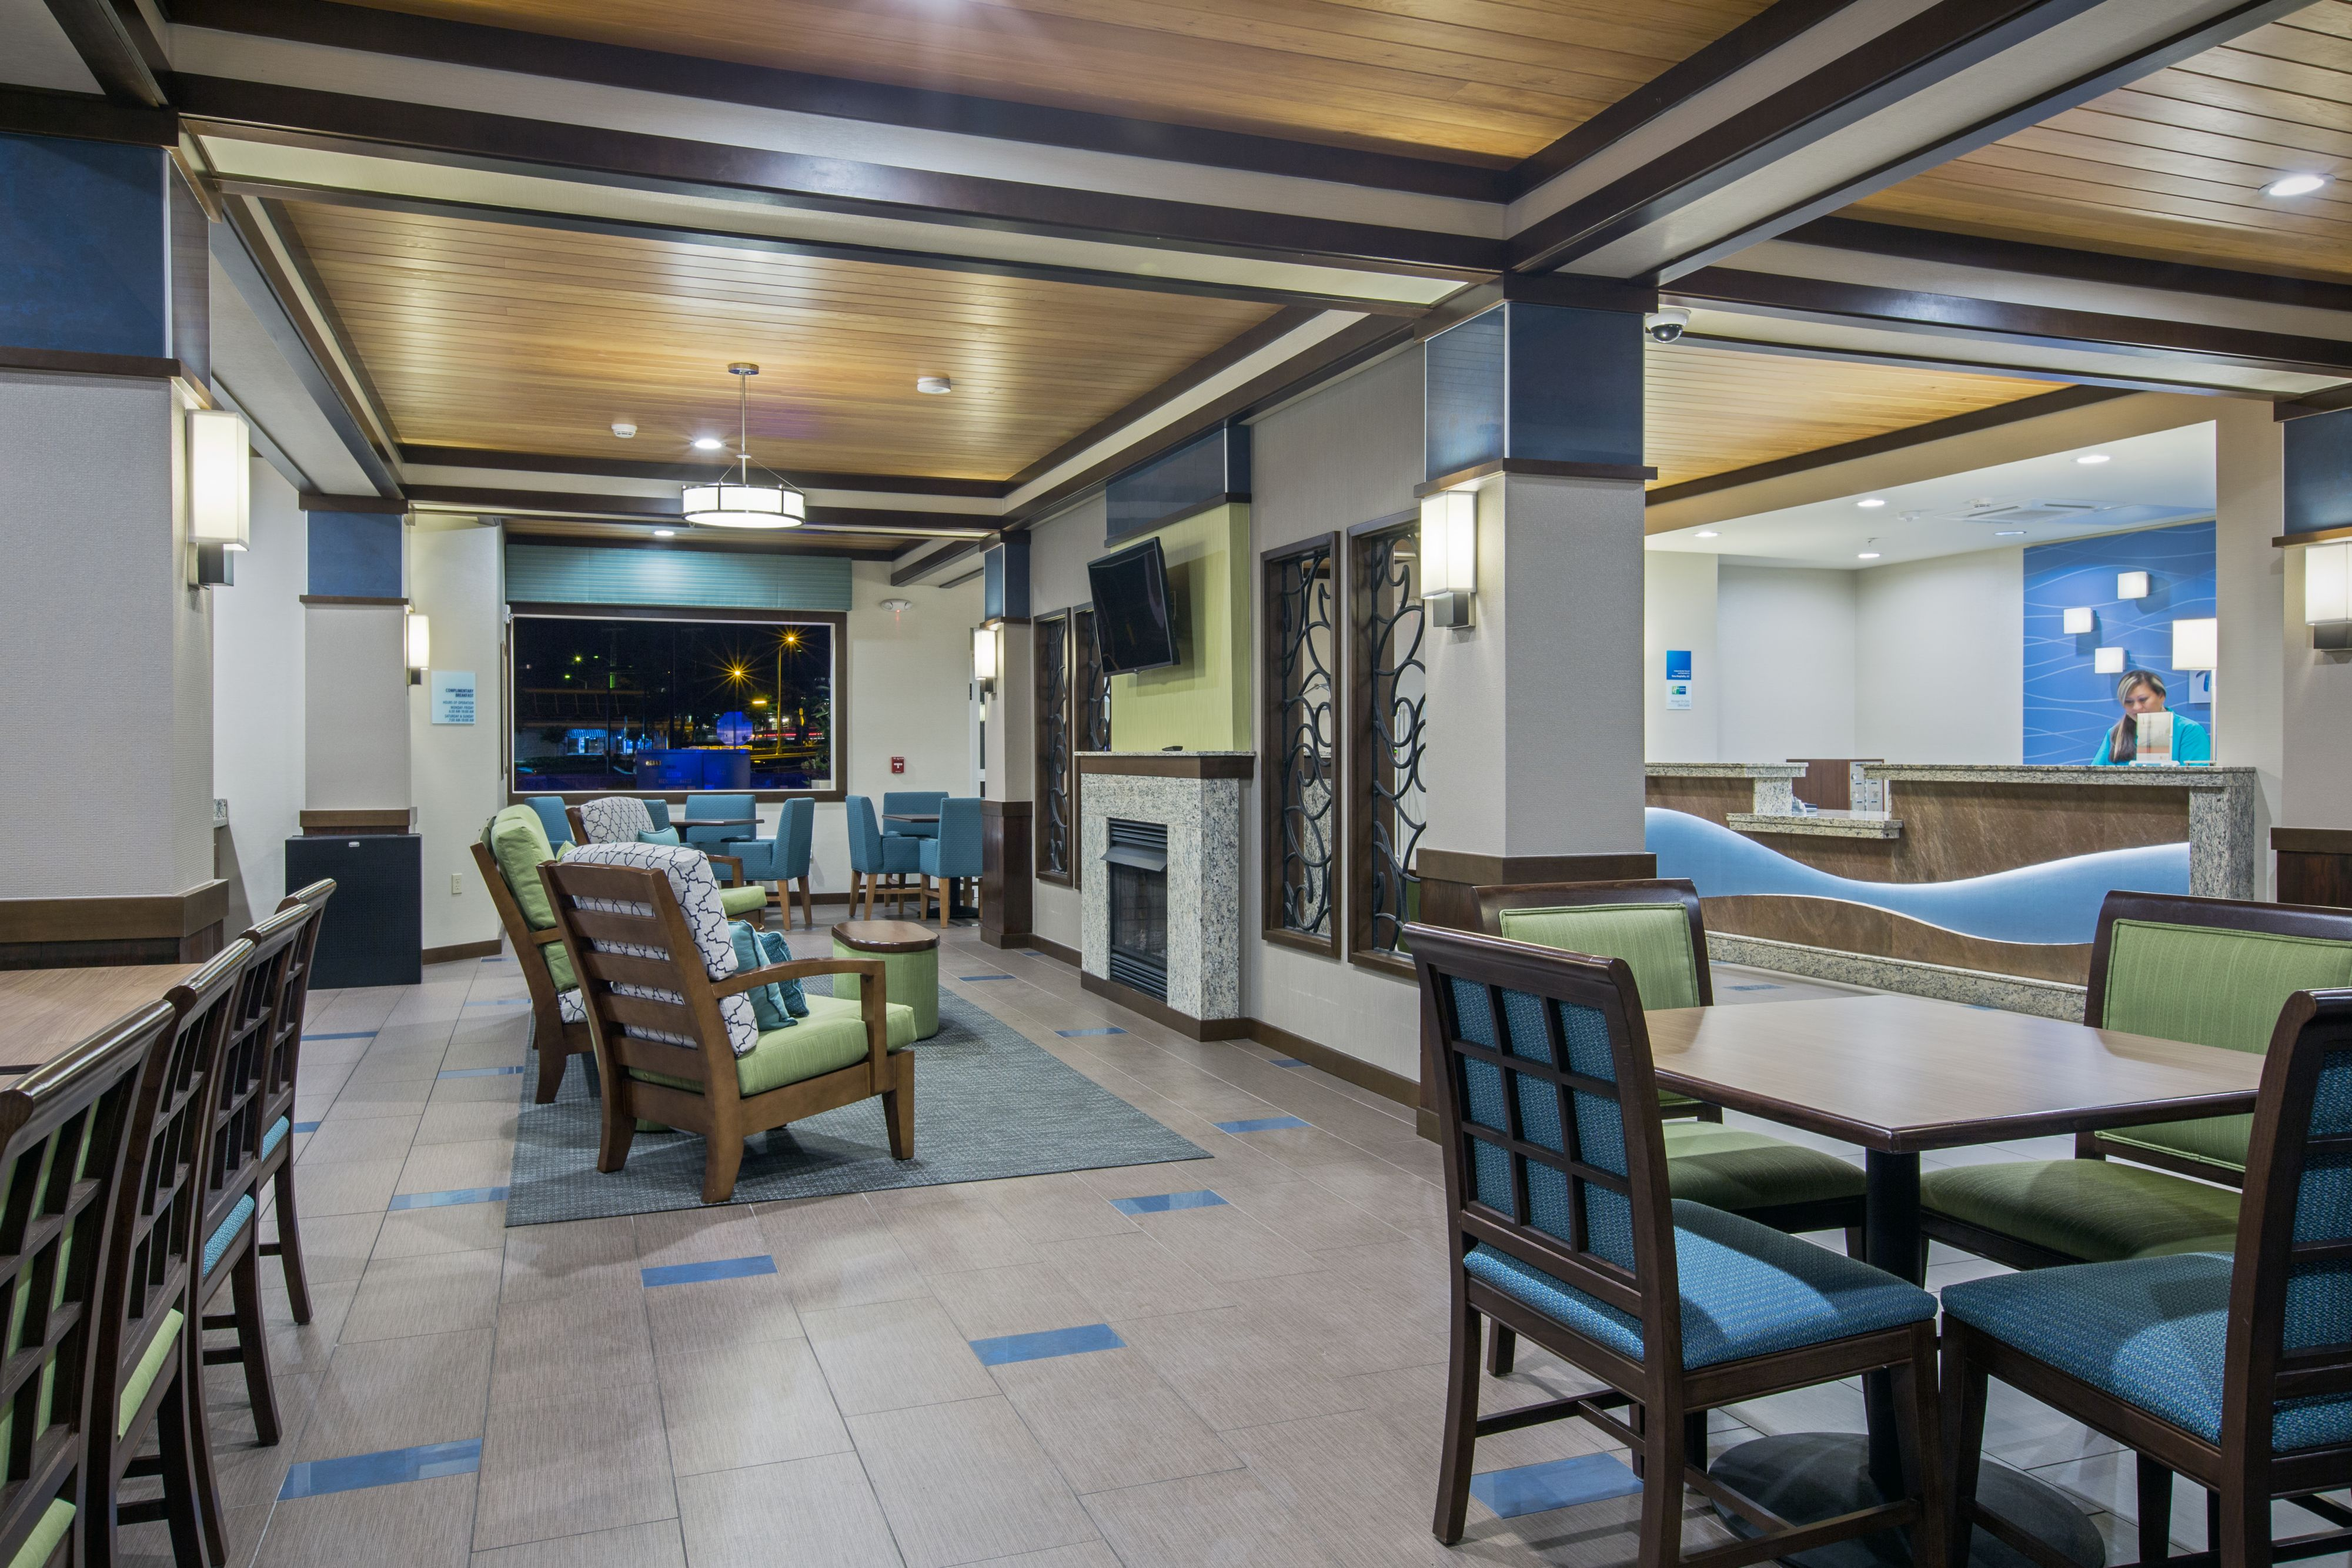 Holiday Inn Express & Suites Kailua-Kona image 5